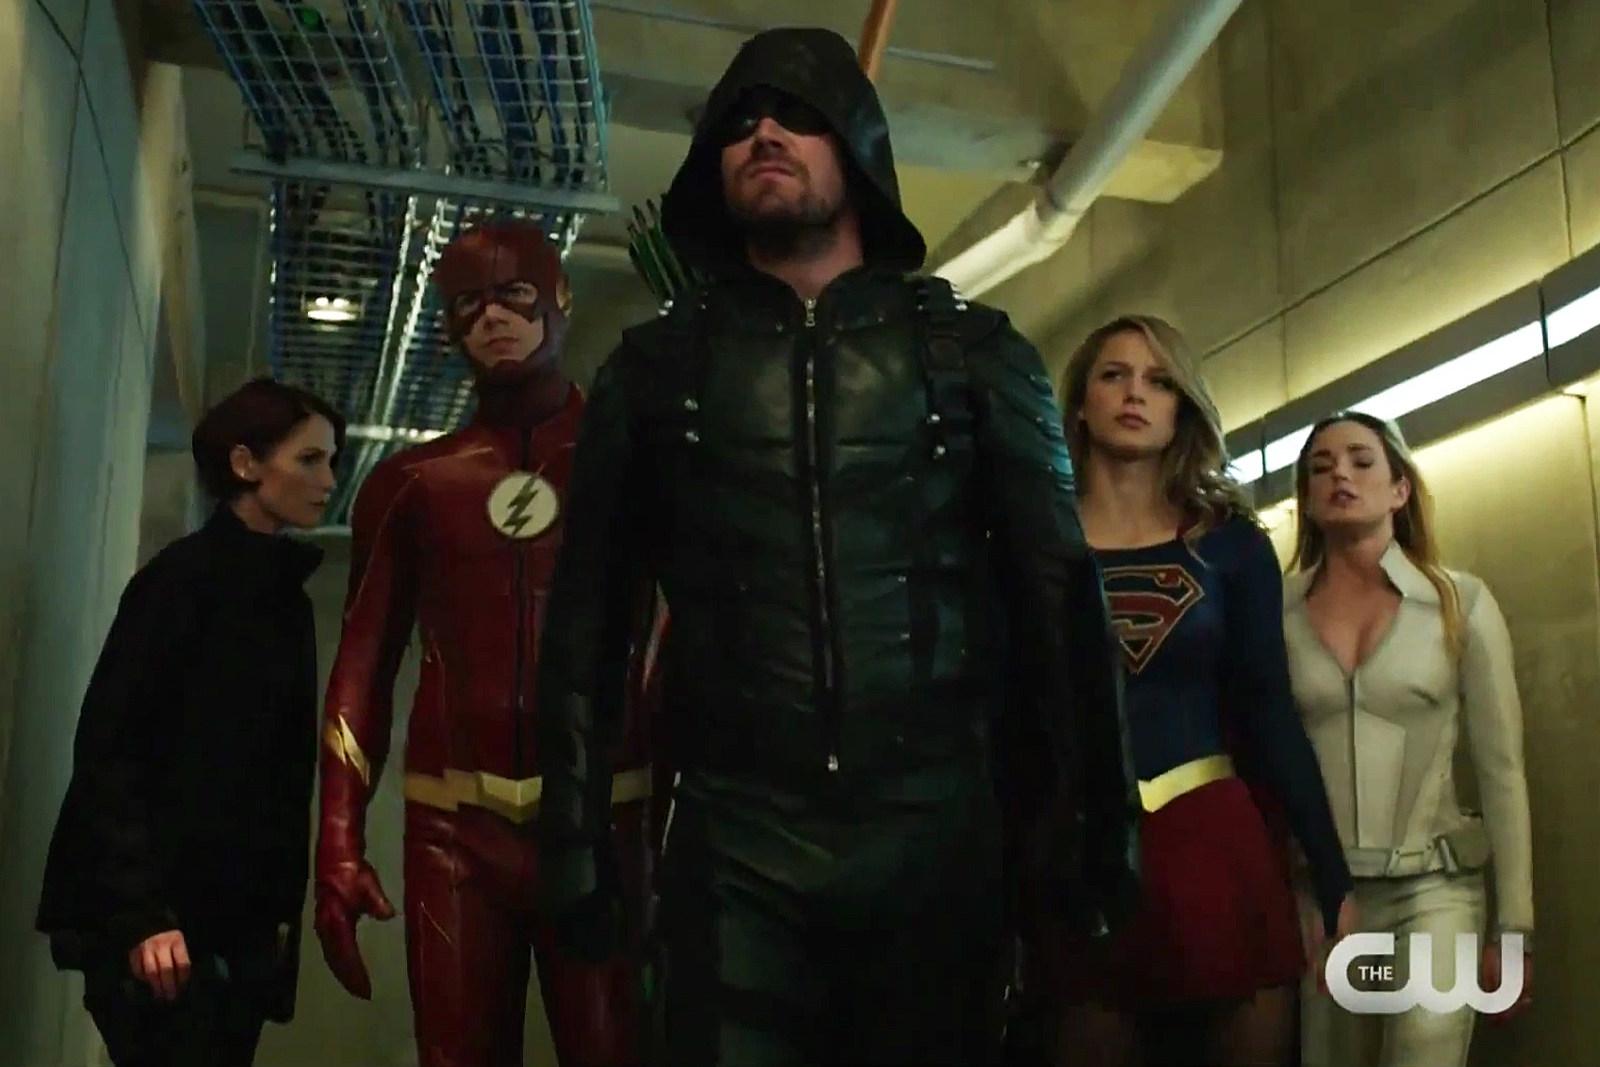 arrow and flash first meet